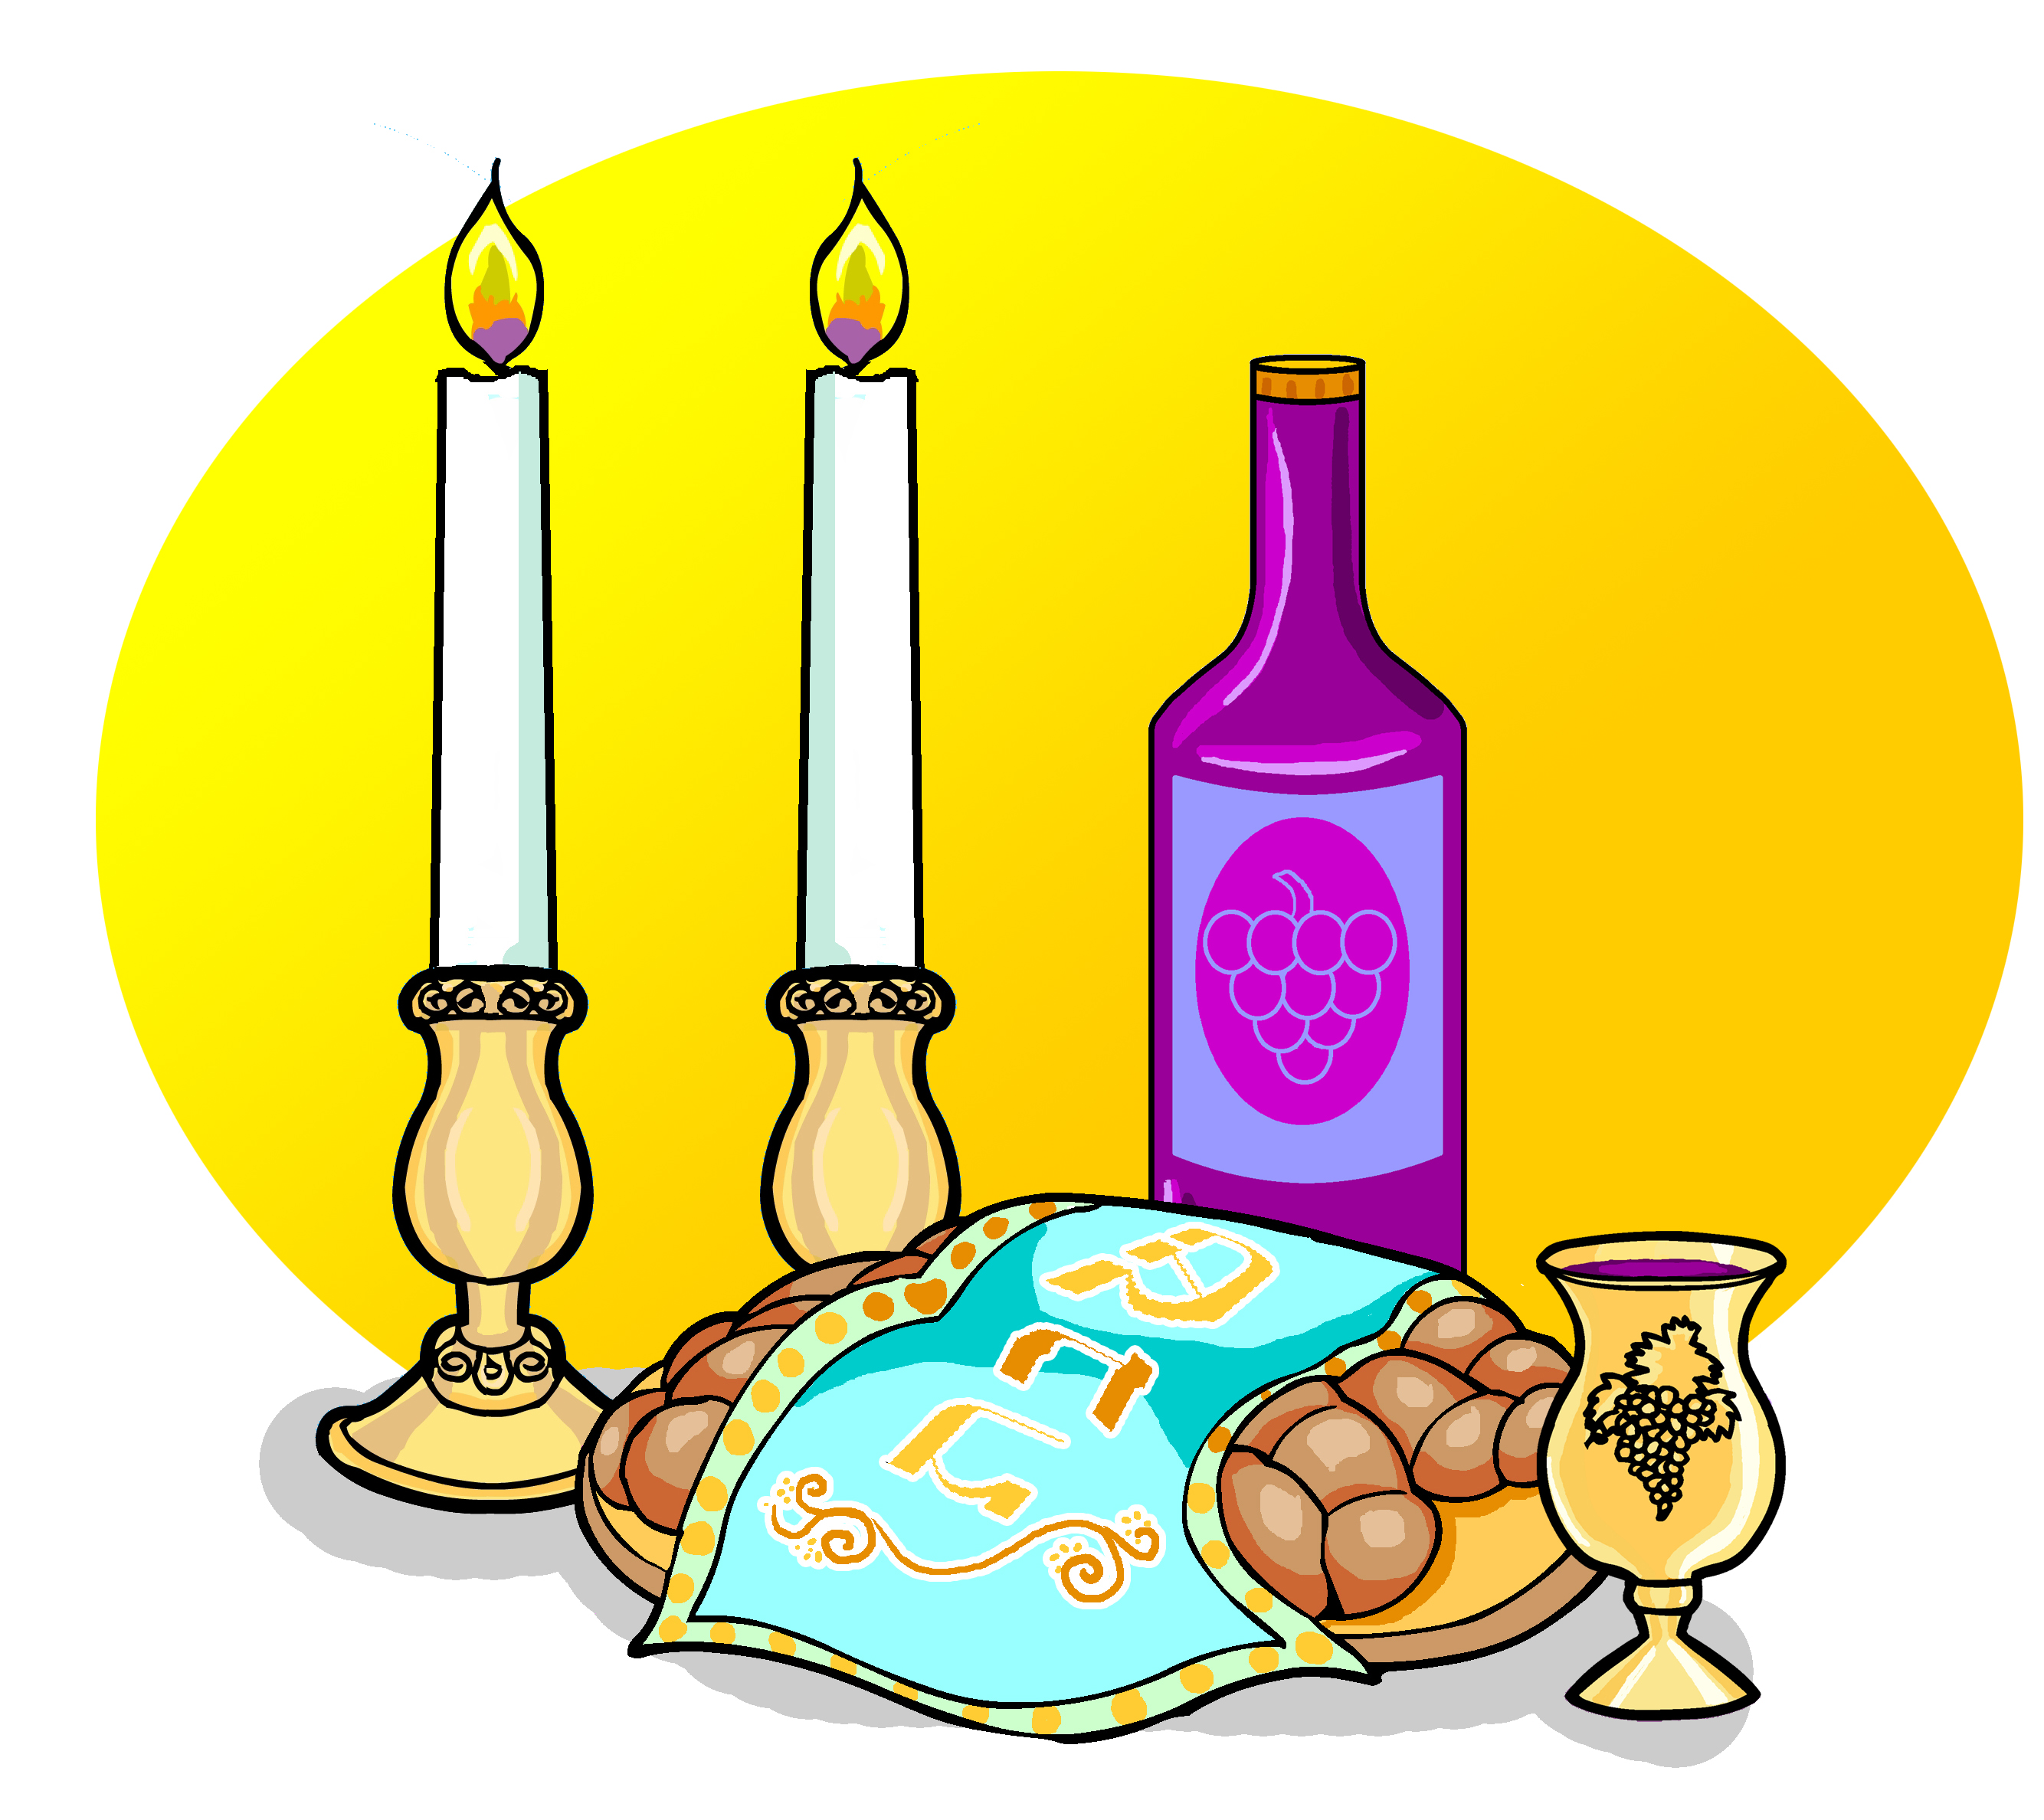 Free Shabbat Cliparts, Download Free Clip Art, Free Clip Art on.